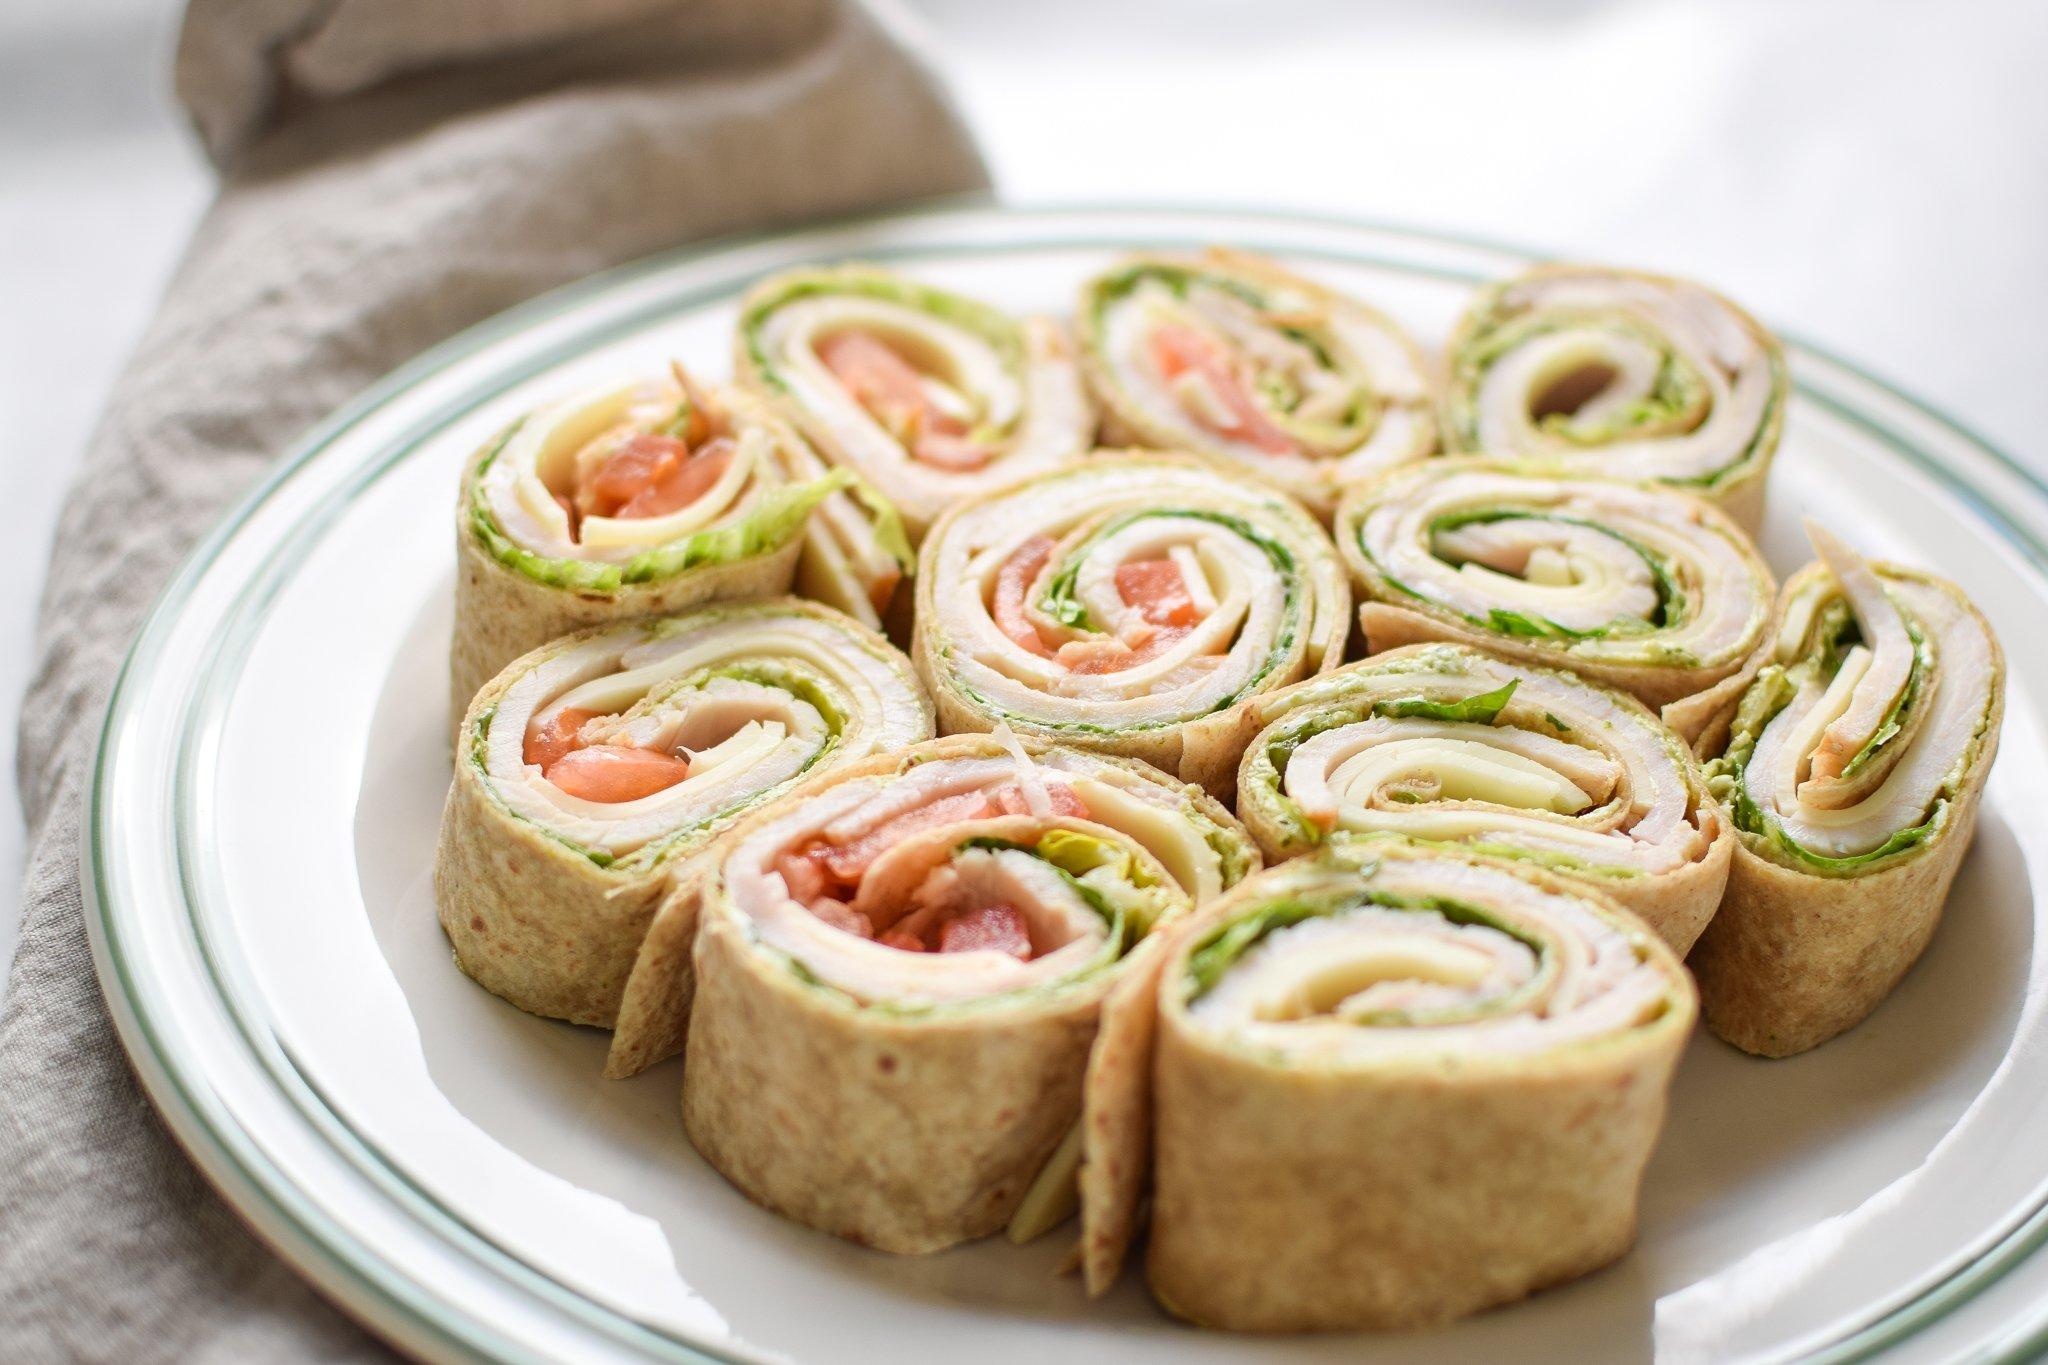 Turkey Pesto Tortilla Pinwheels - My favorite deli cold lunch in a homemade version PLUS pesto!! LOVE. - ProjectMealPlan.com